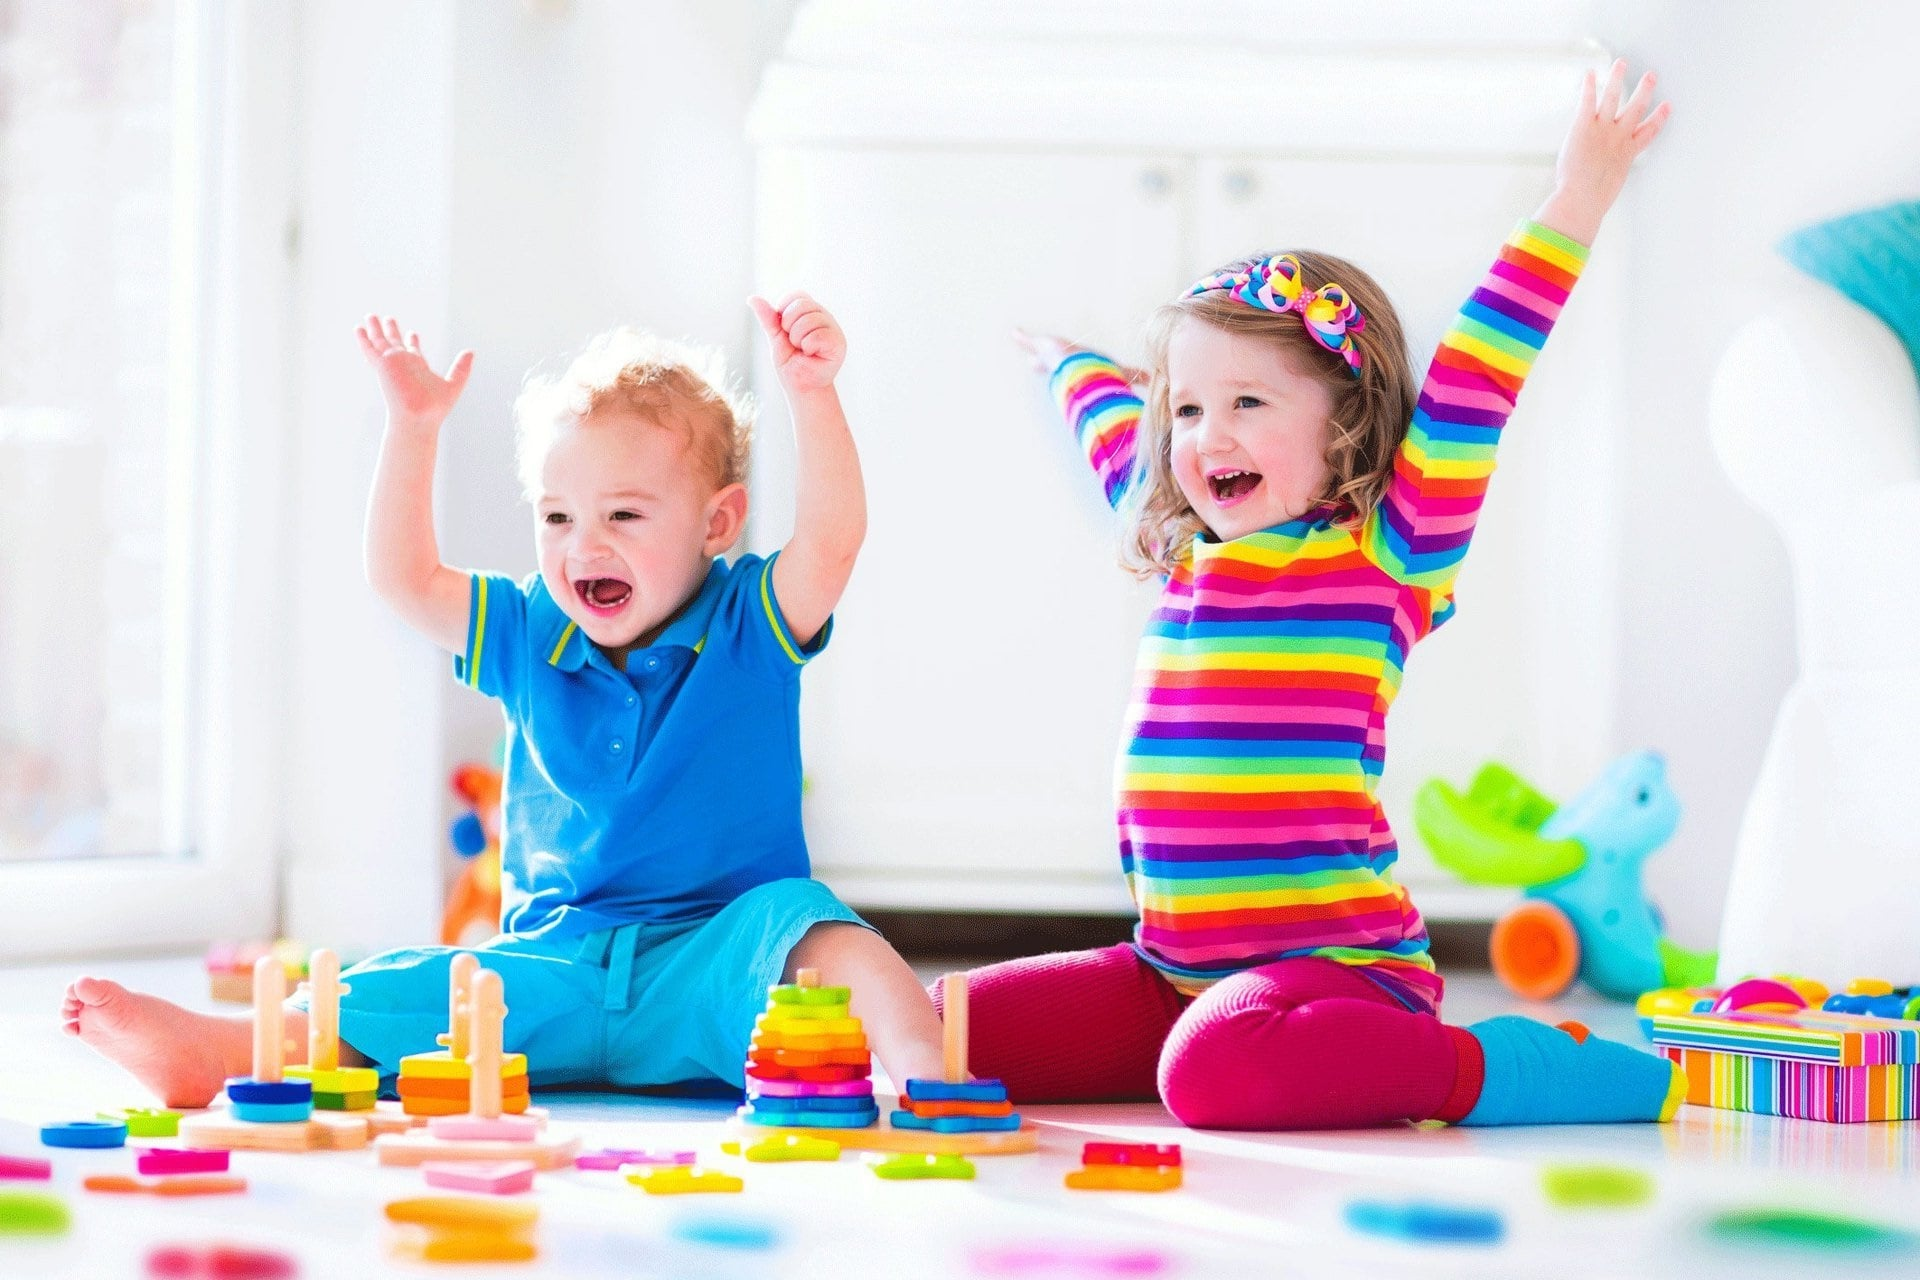 actividades extraescolares en valencia - juguetes